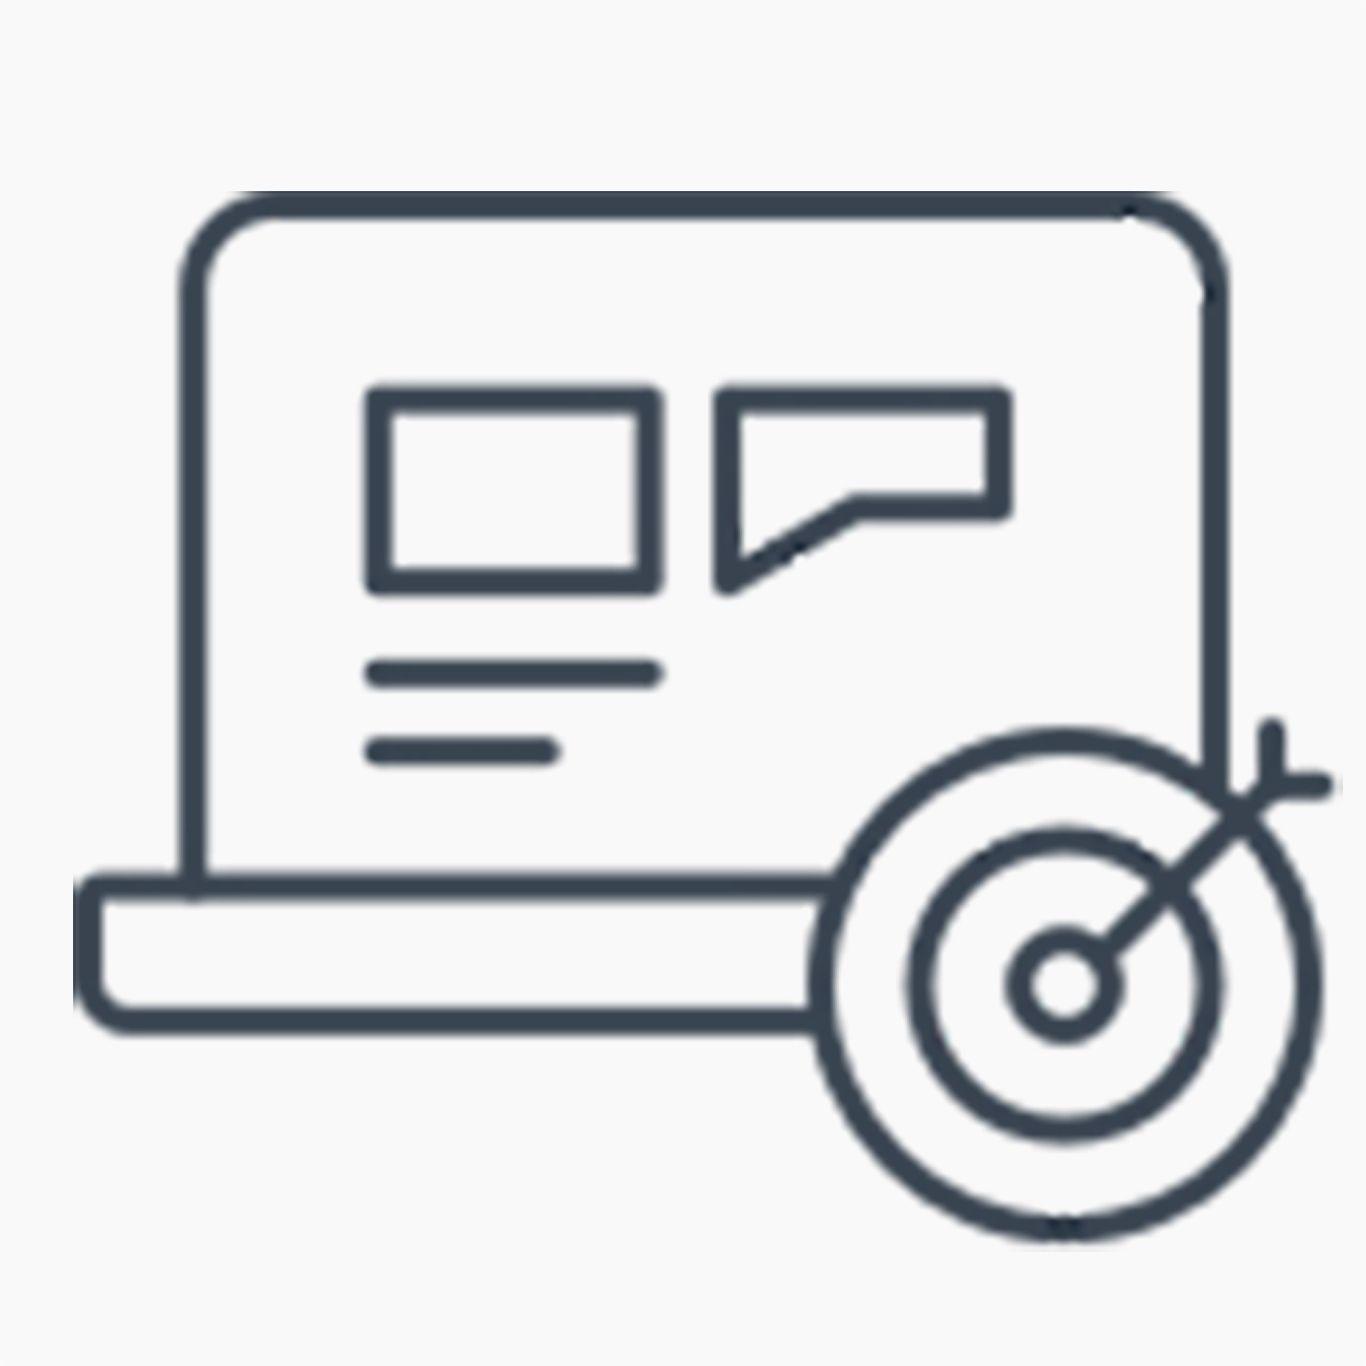 Laptop icon with bull's eye symbol